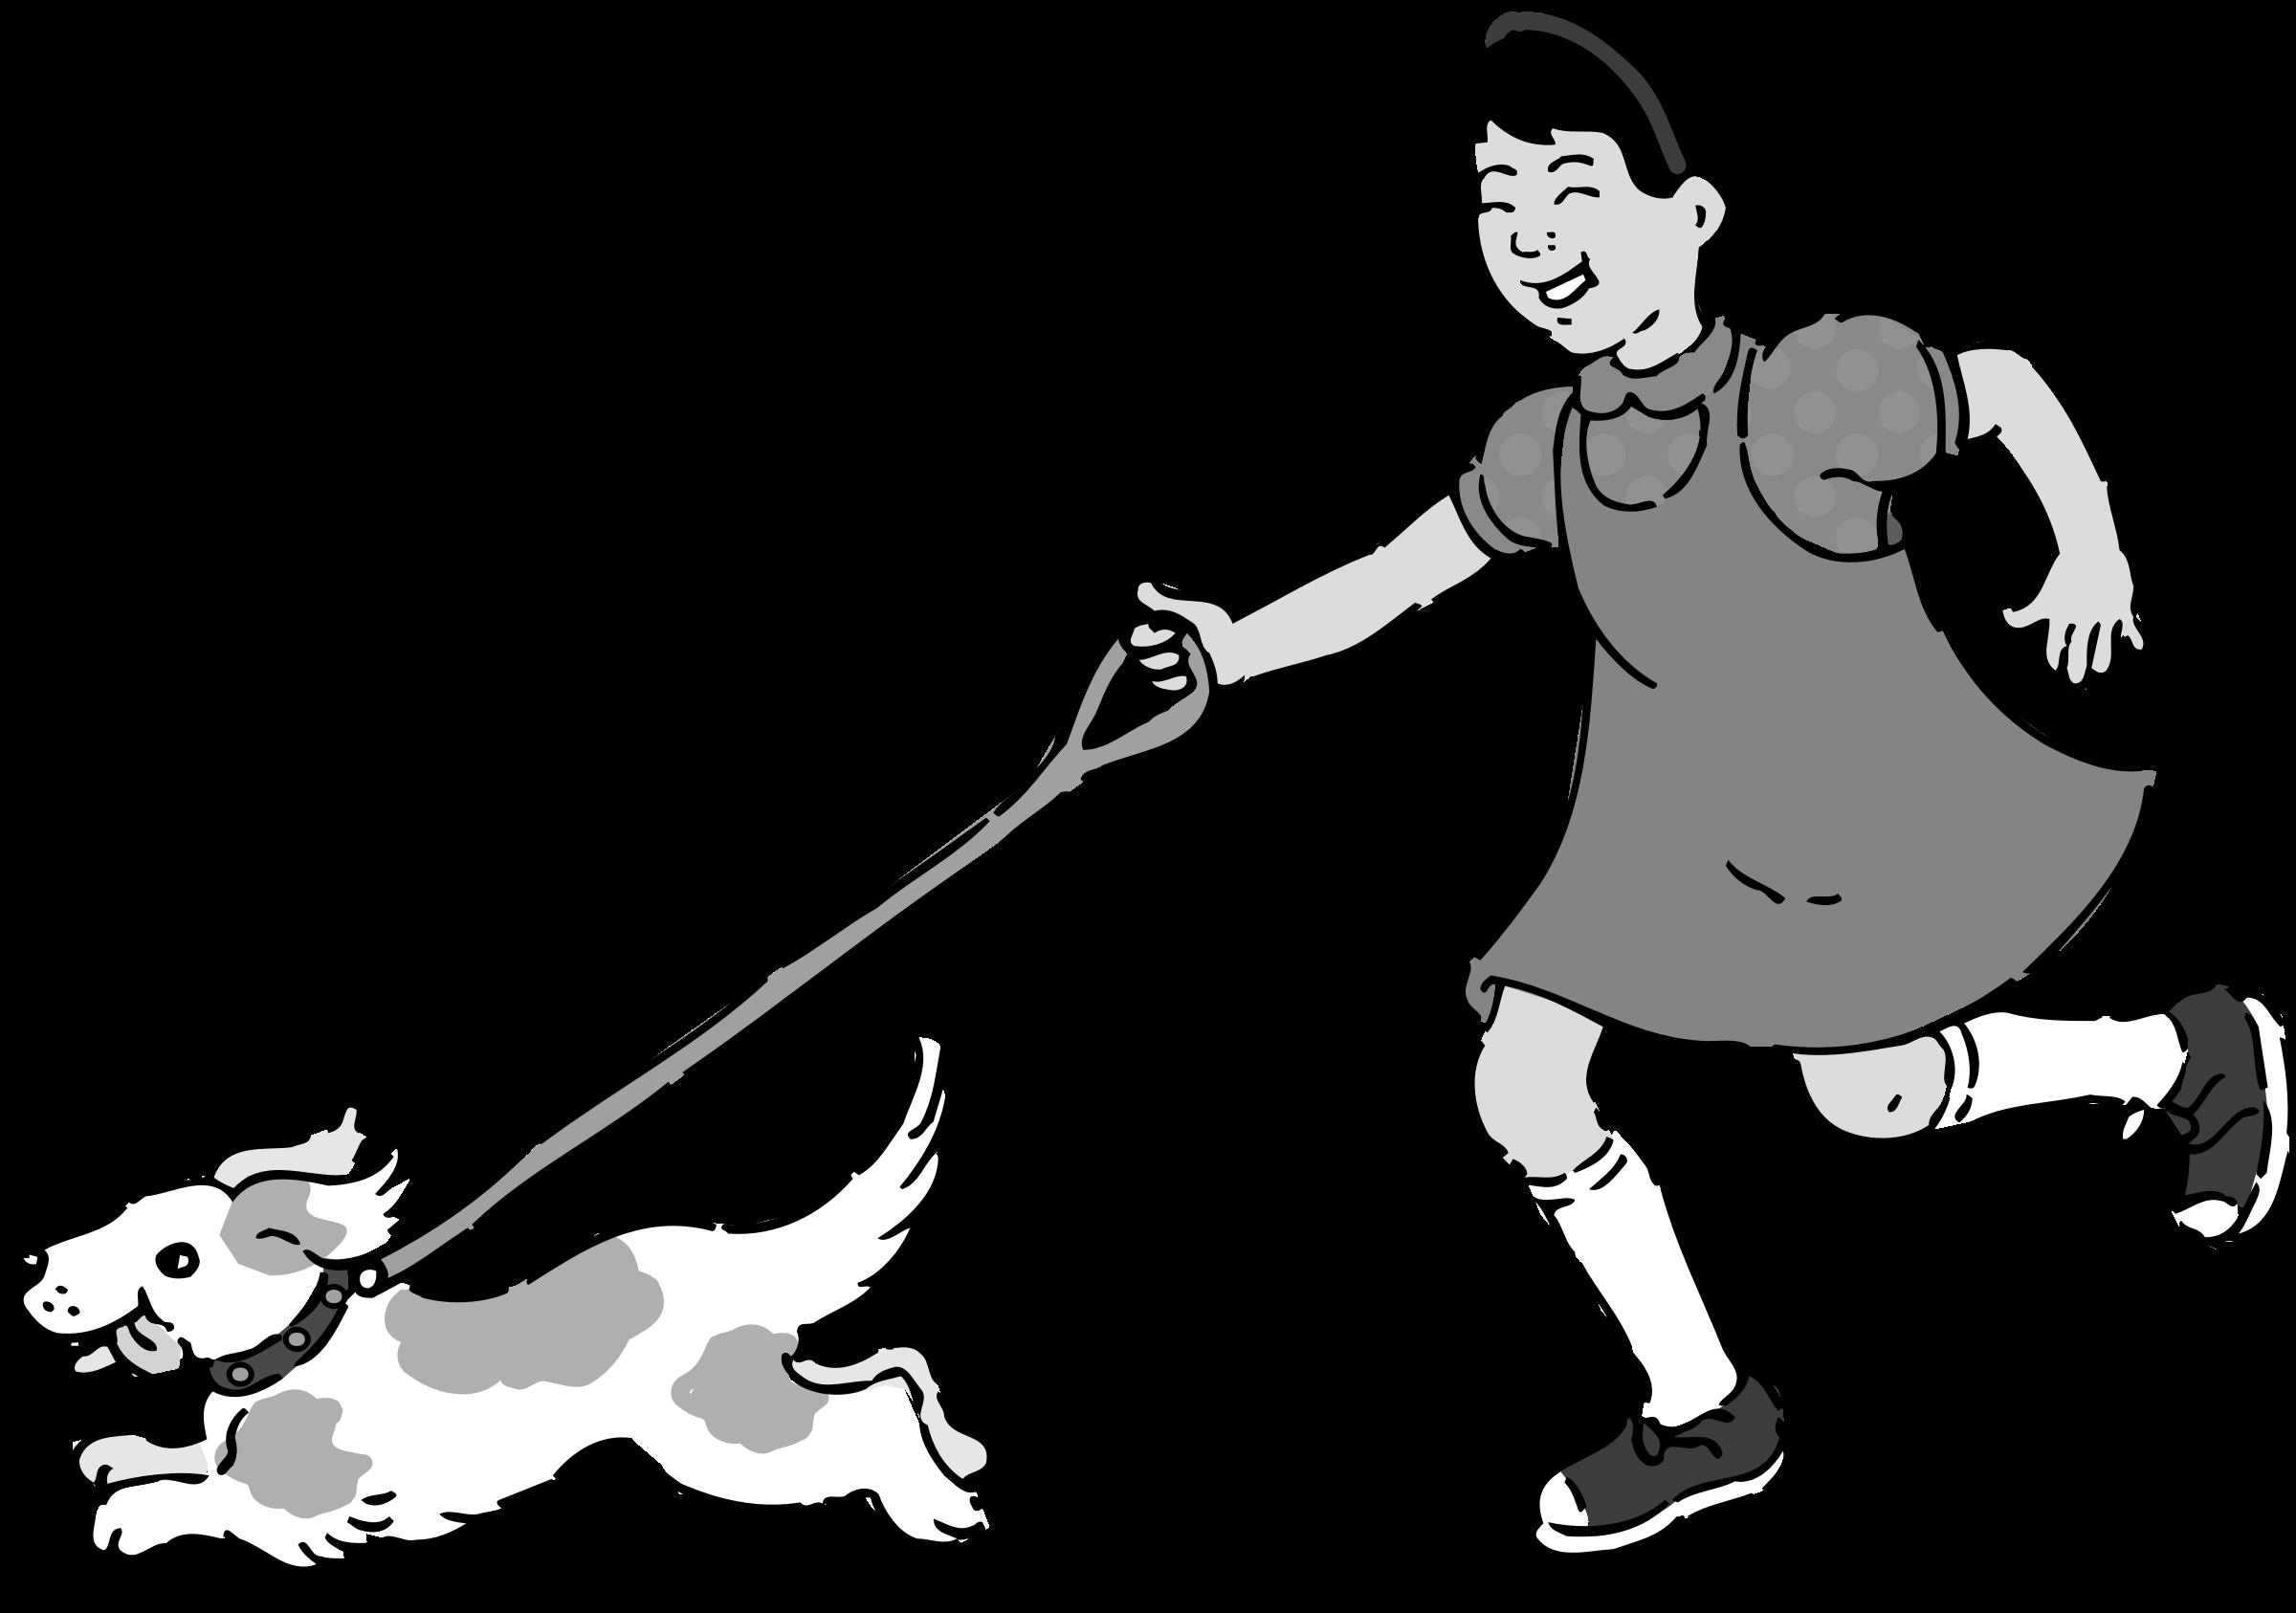 Dog clipartblack com animal. Clipart walking skip